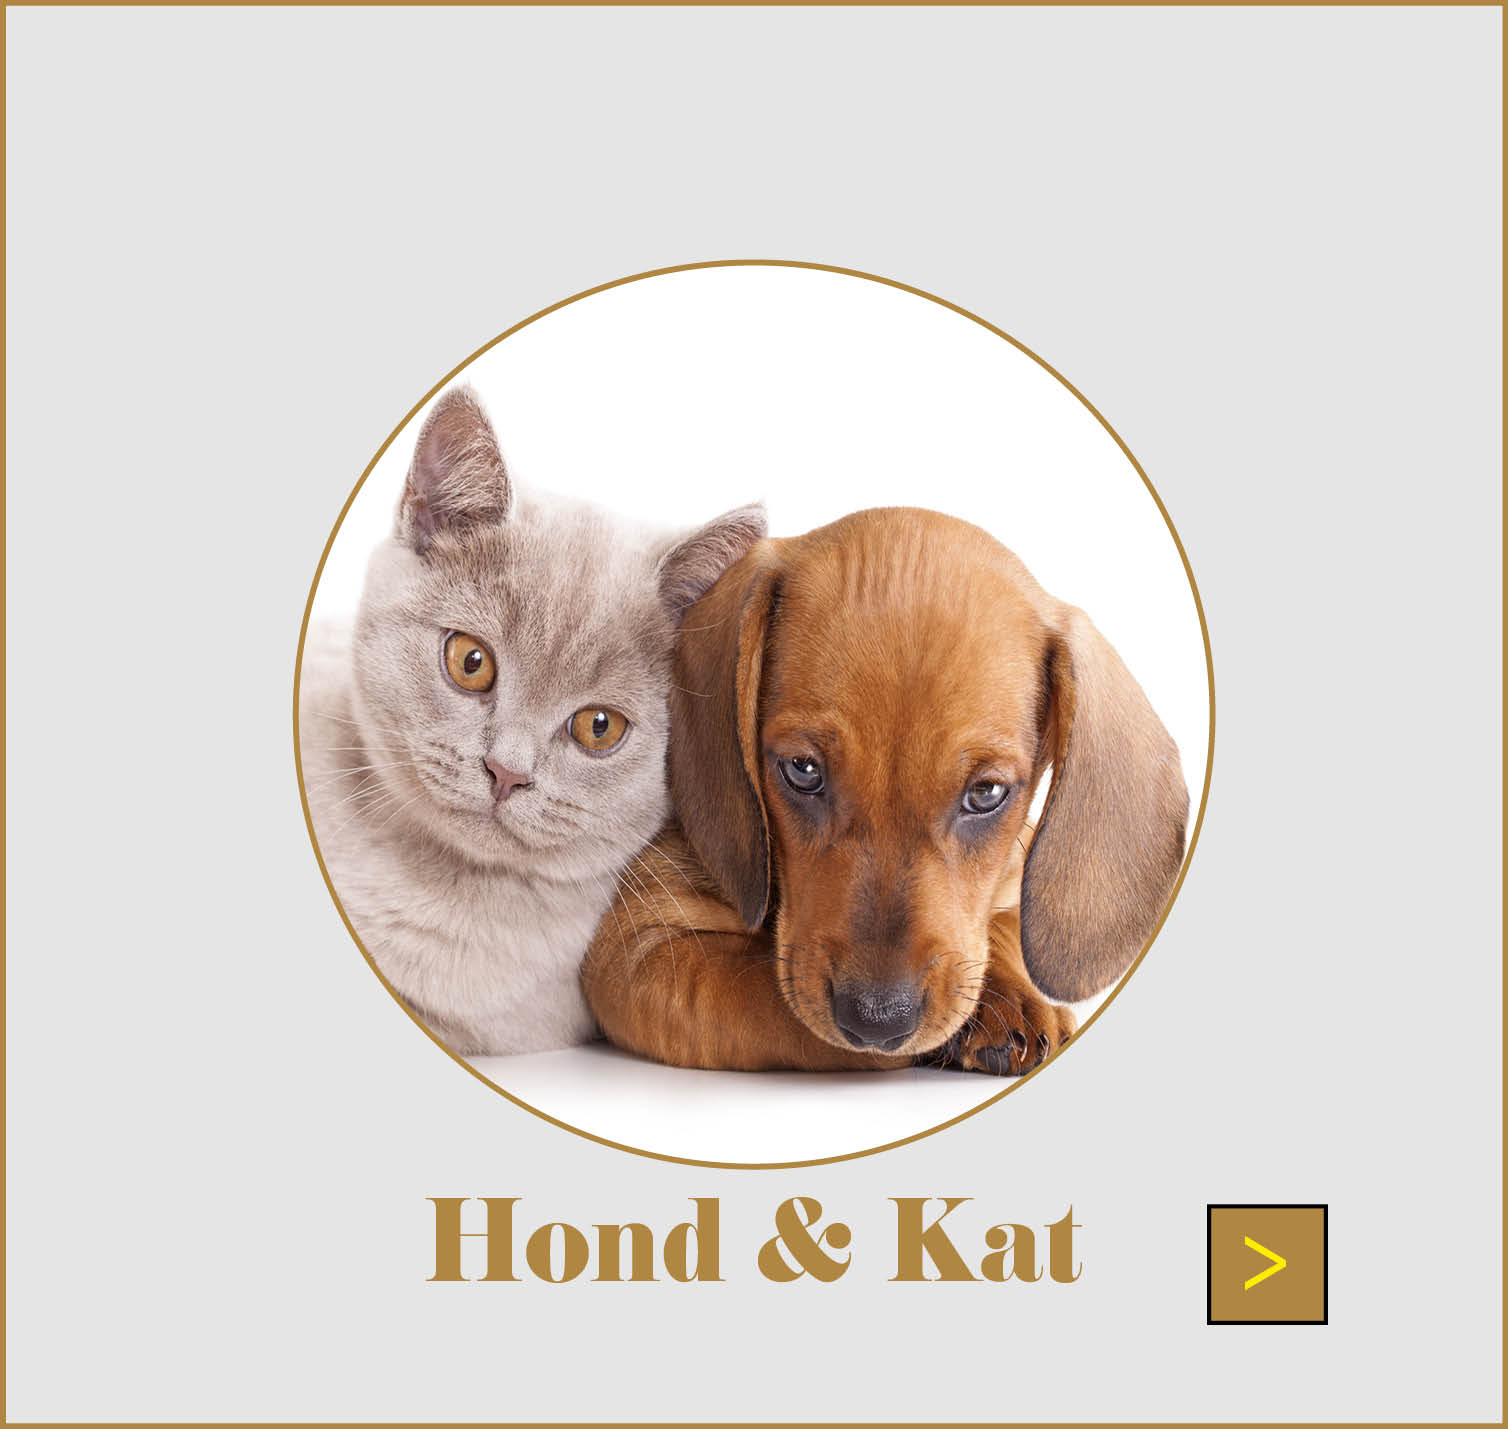 RUBRIEK HOND & KAT